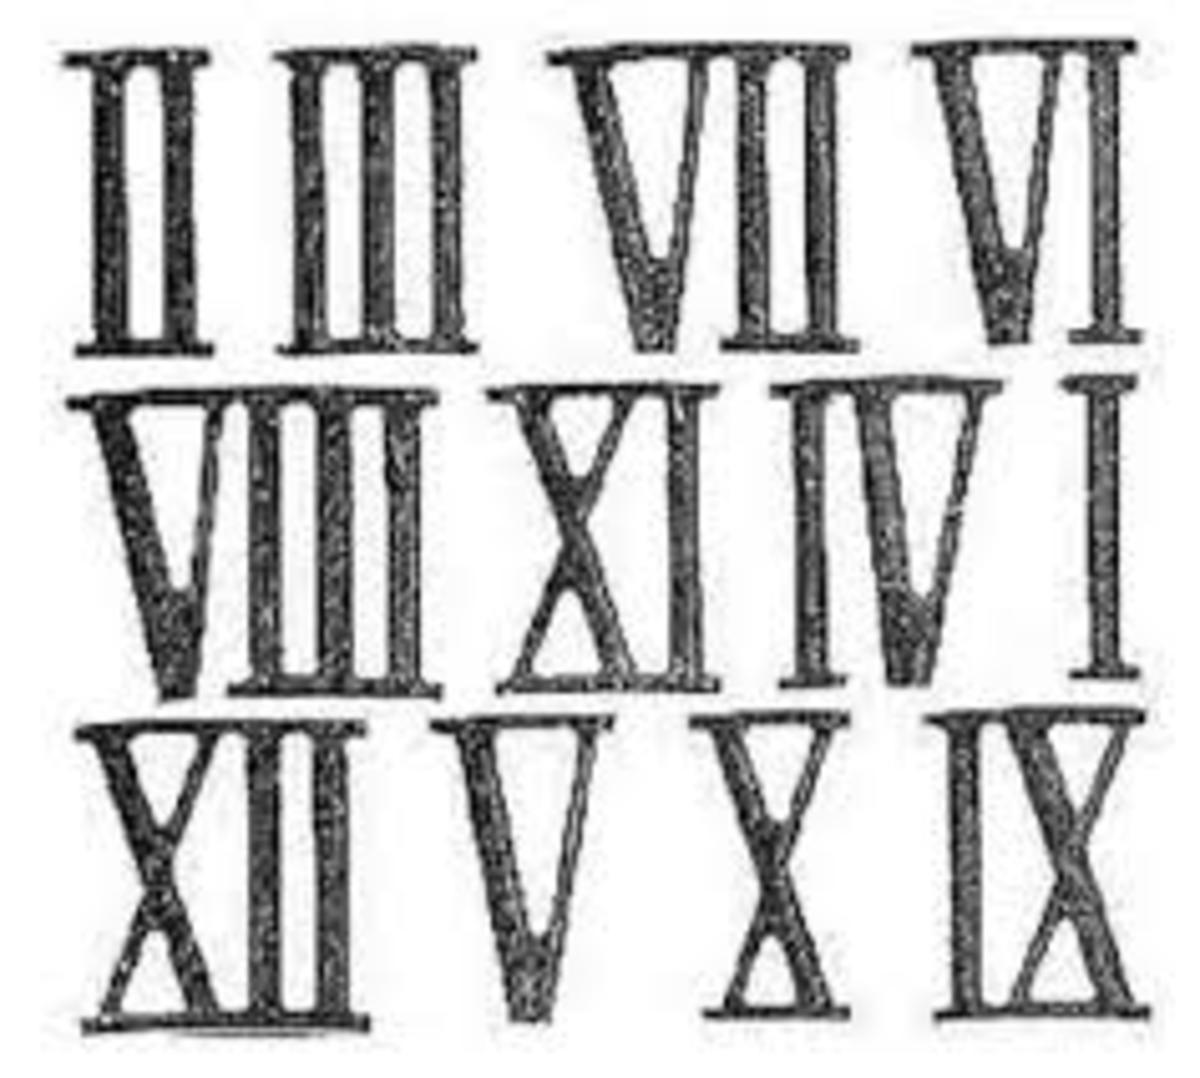 How To Understand Roman Numerals